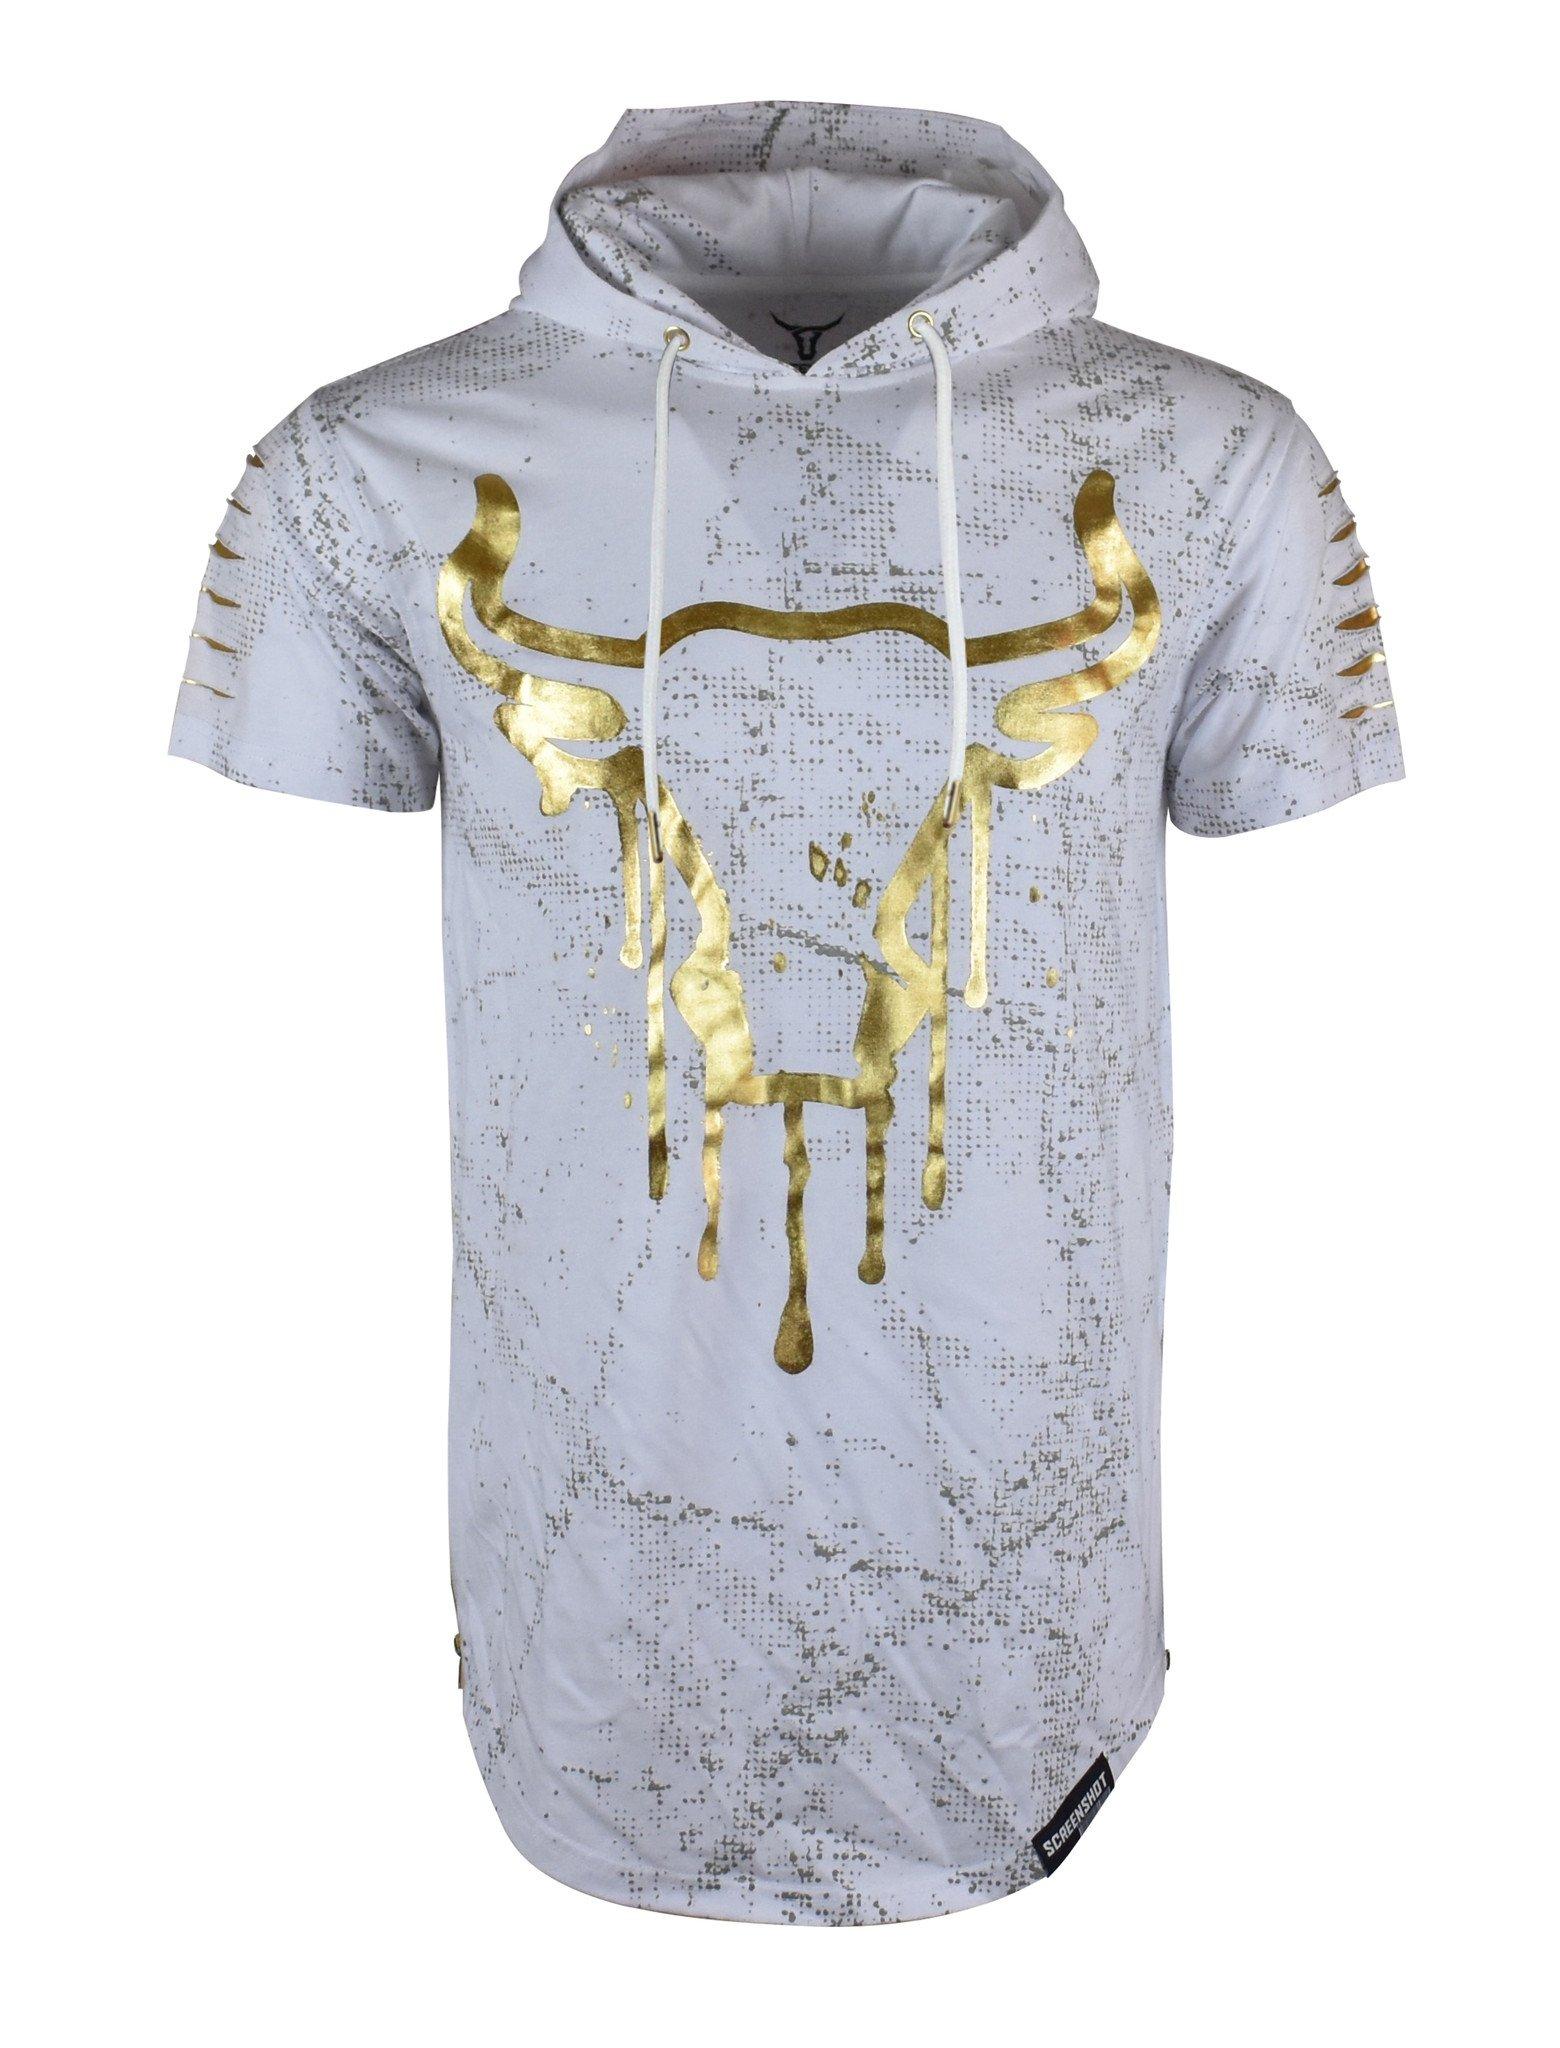 SCREENSHOT SCREENSHOTBRAND-732 Mens Hip Hop Longline Premium Tee - Pullover Hooded Fashion T-Shirt w/Side Zipper Bull Print - White - Small